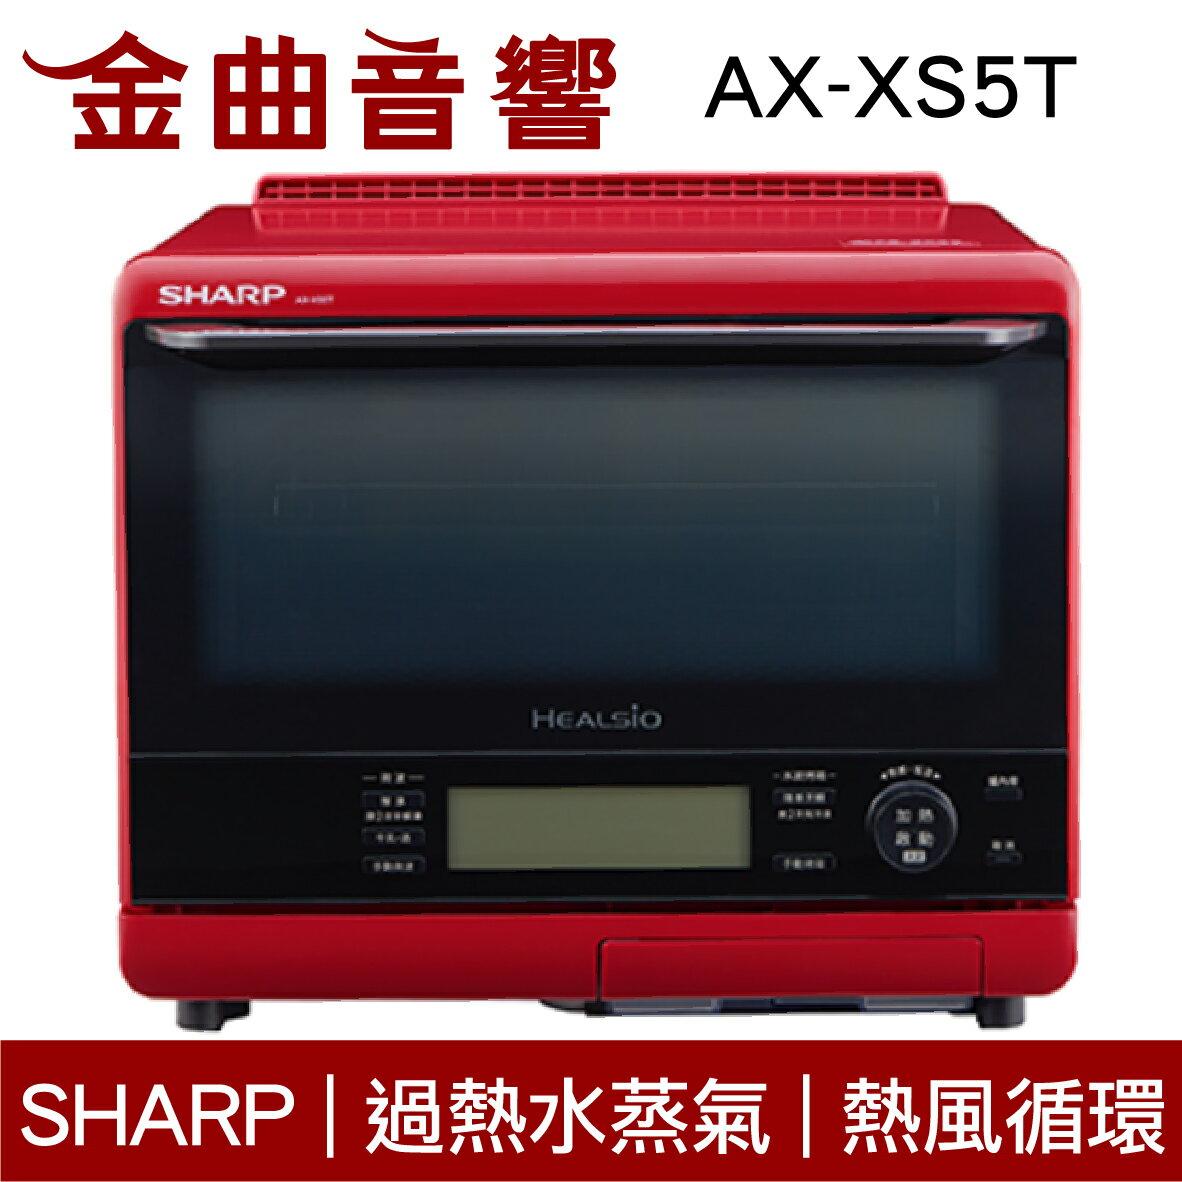 SHARP 夏普 AX-XS5T 自動料理兼烘培達人機 水波爐 2020   金曲音響